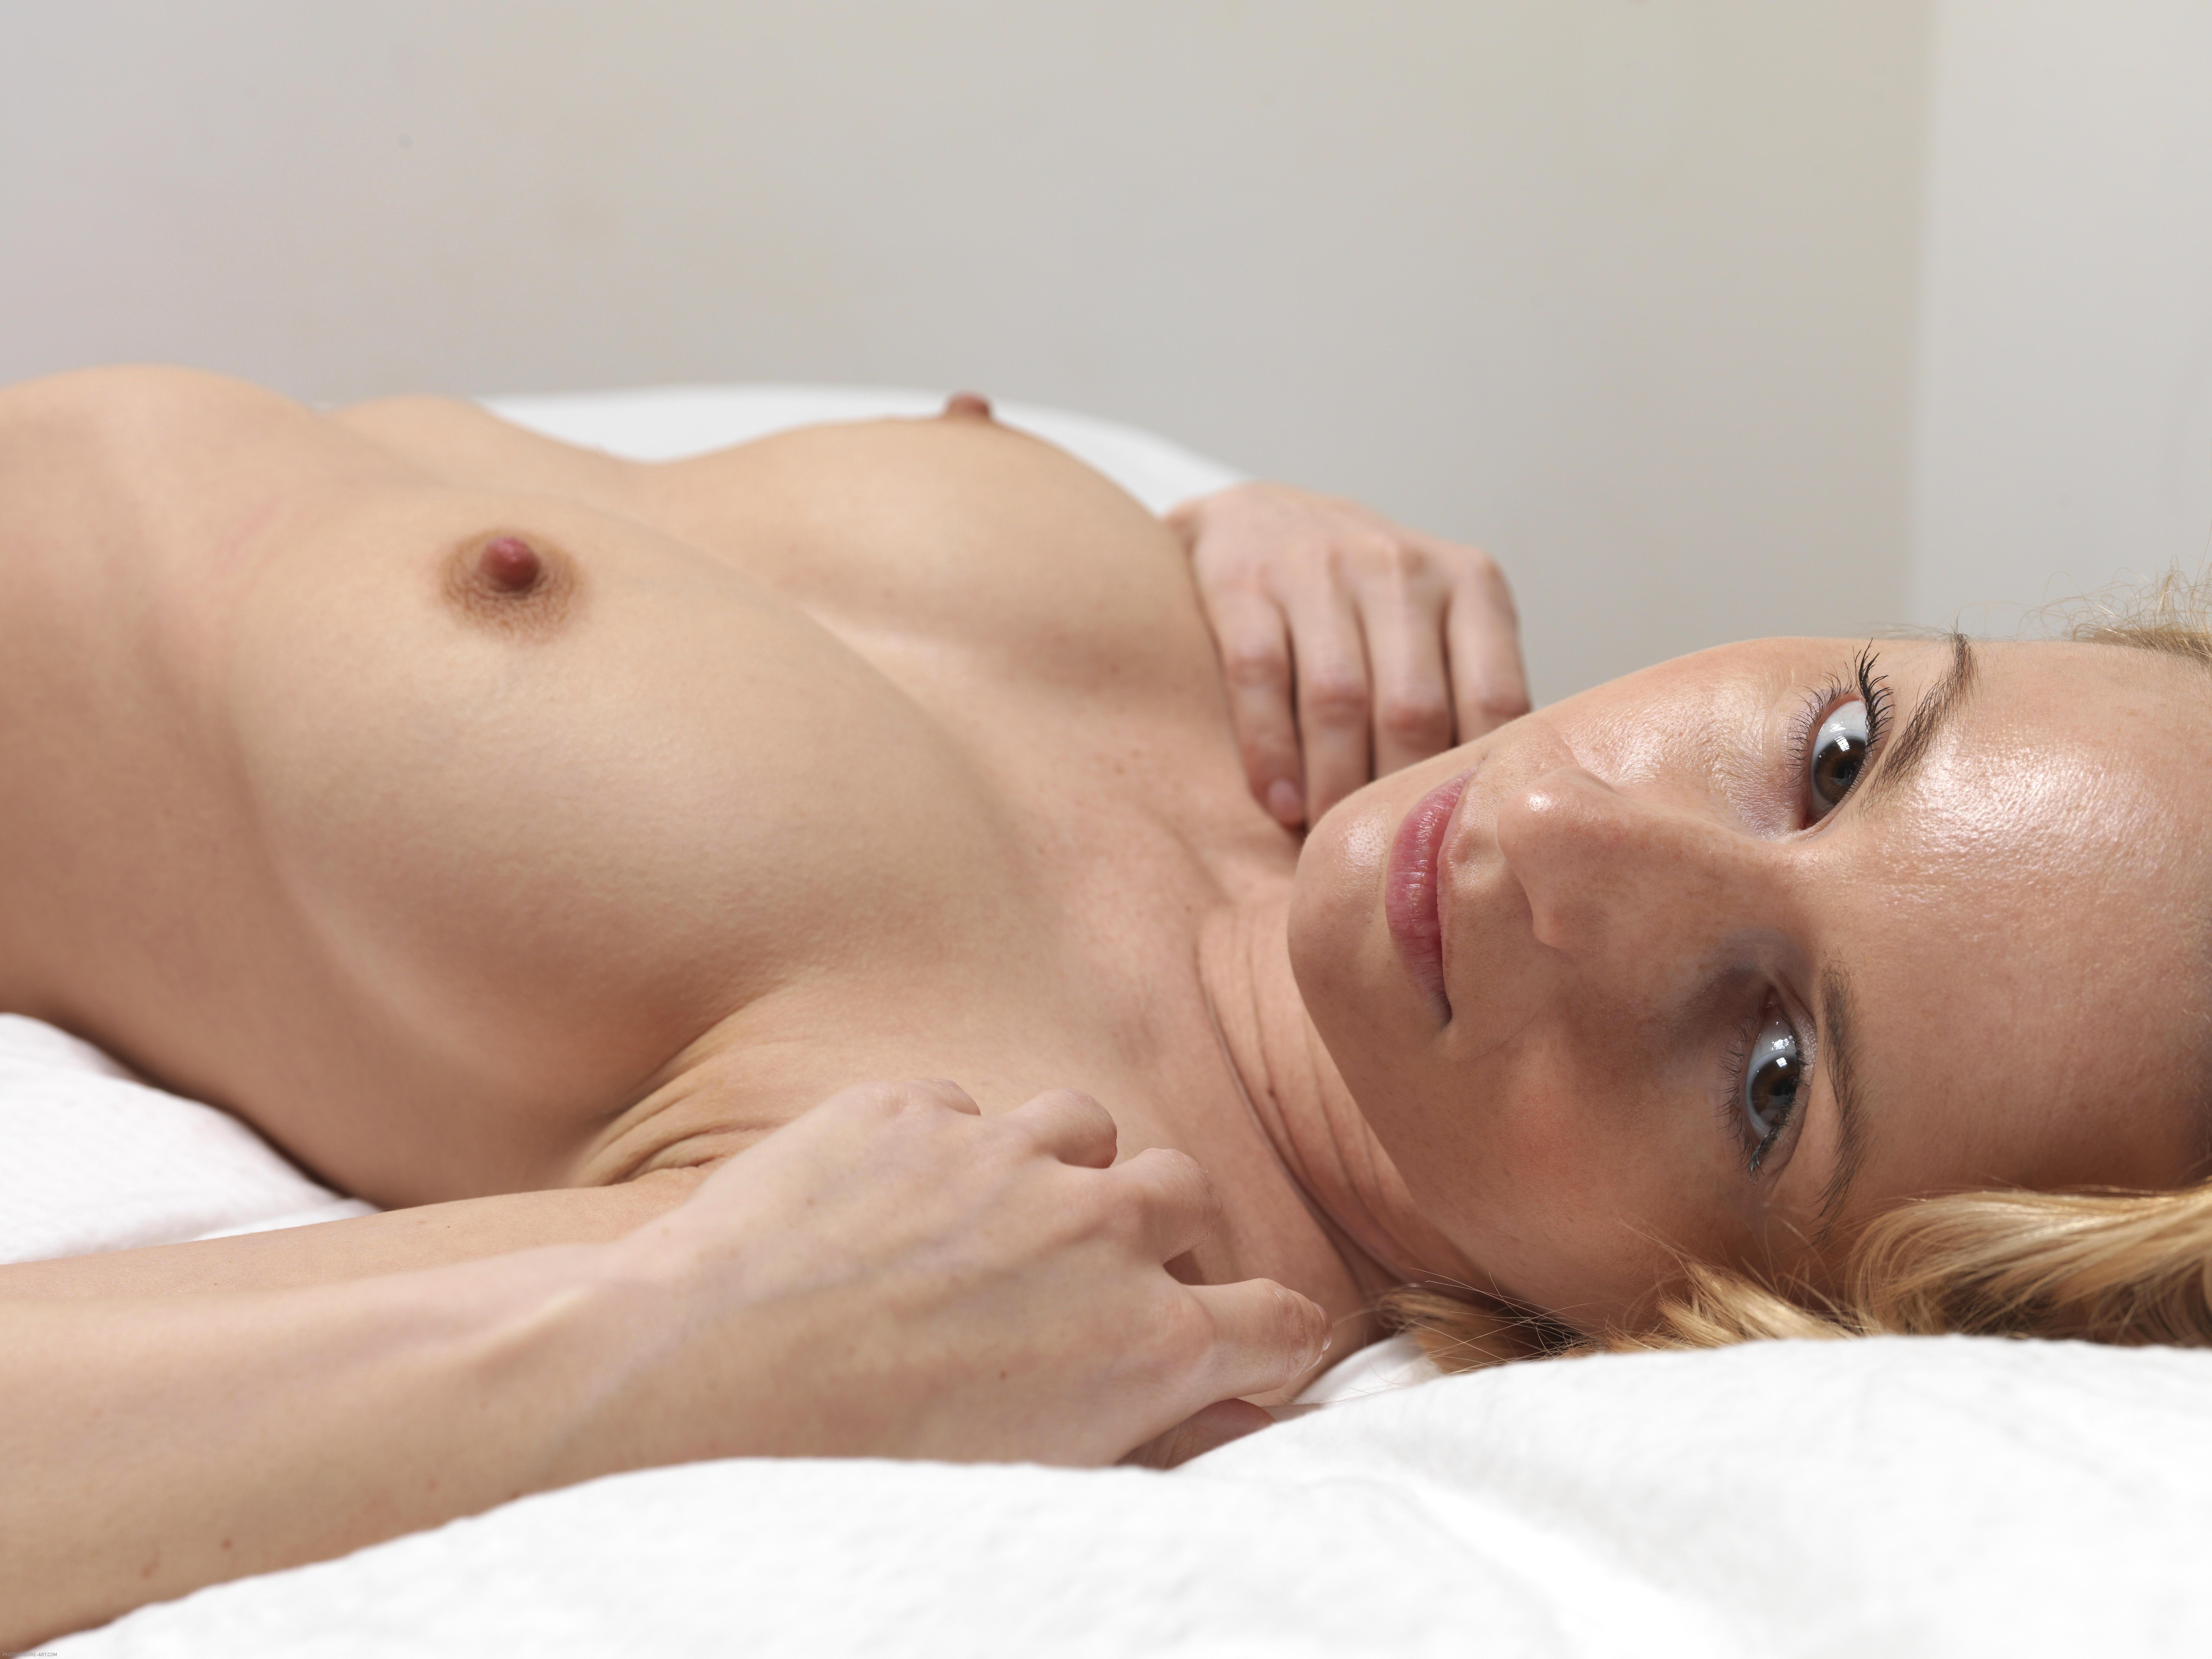 iphone porn milky boob videos